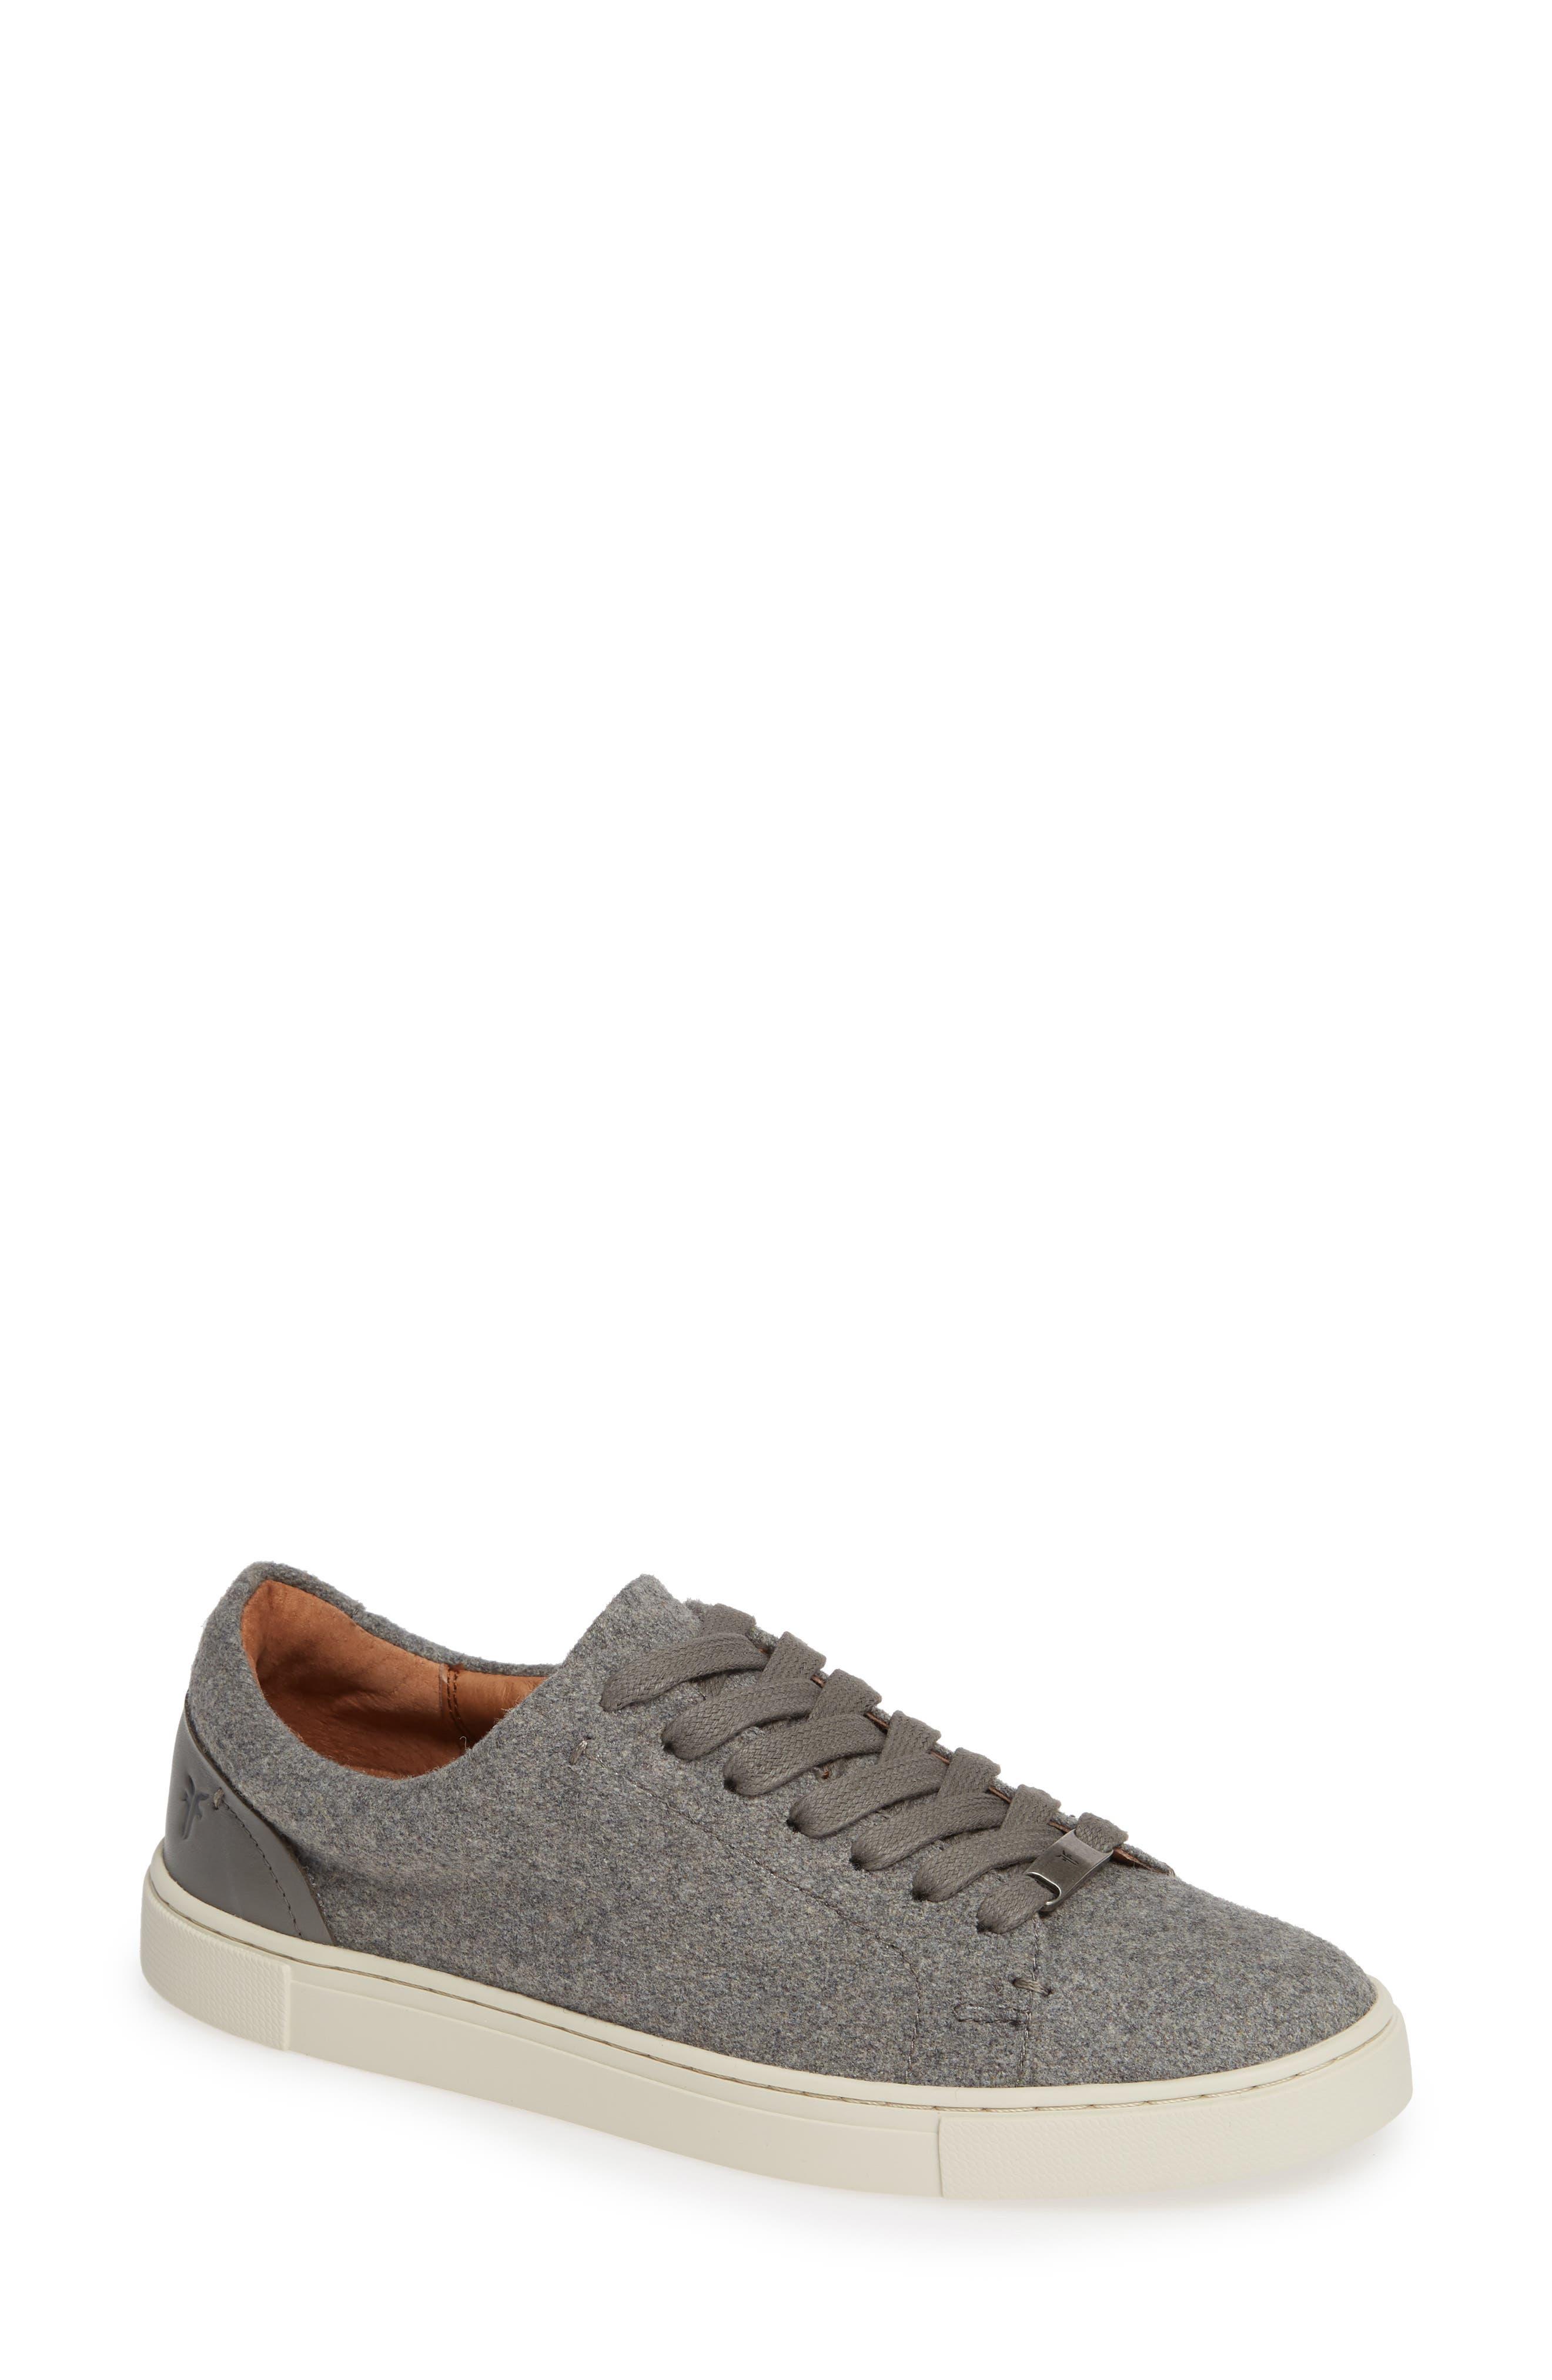 Ivy Sneaker,                         Main,                         color, GREY WOOL FABRIC